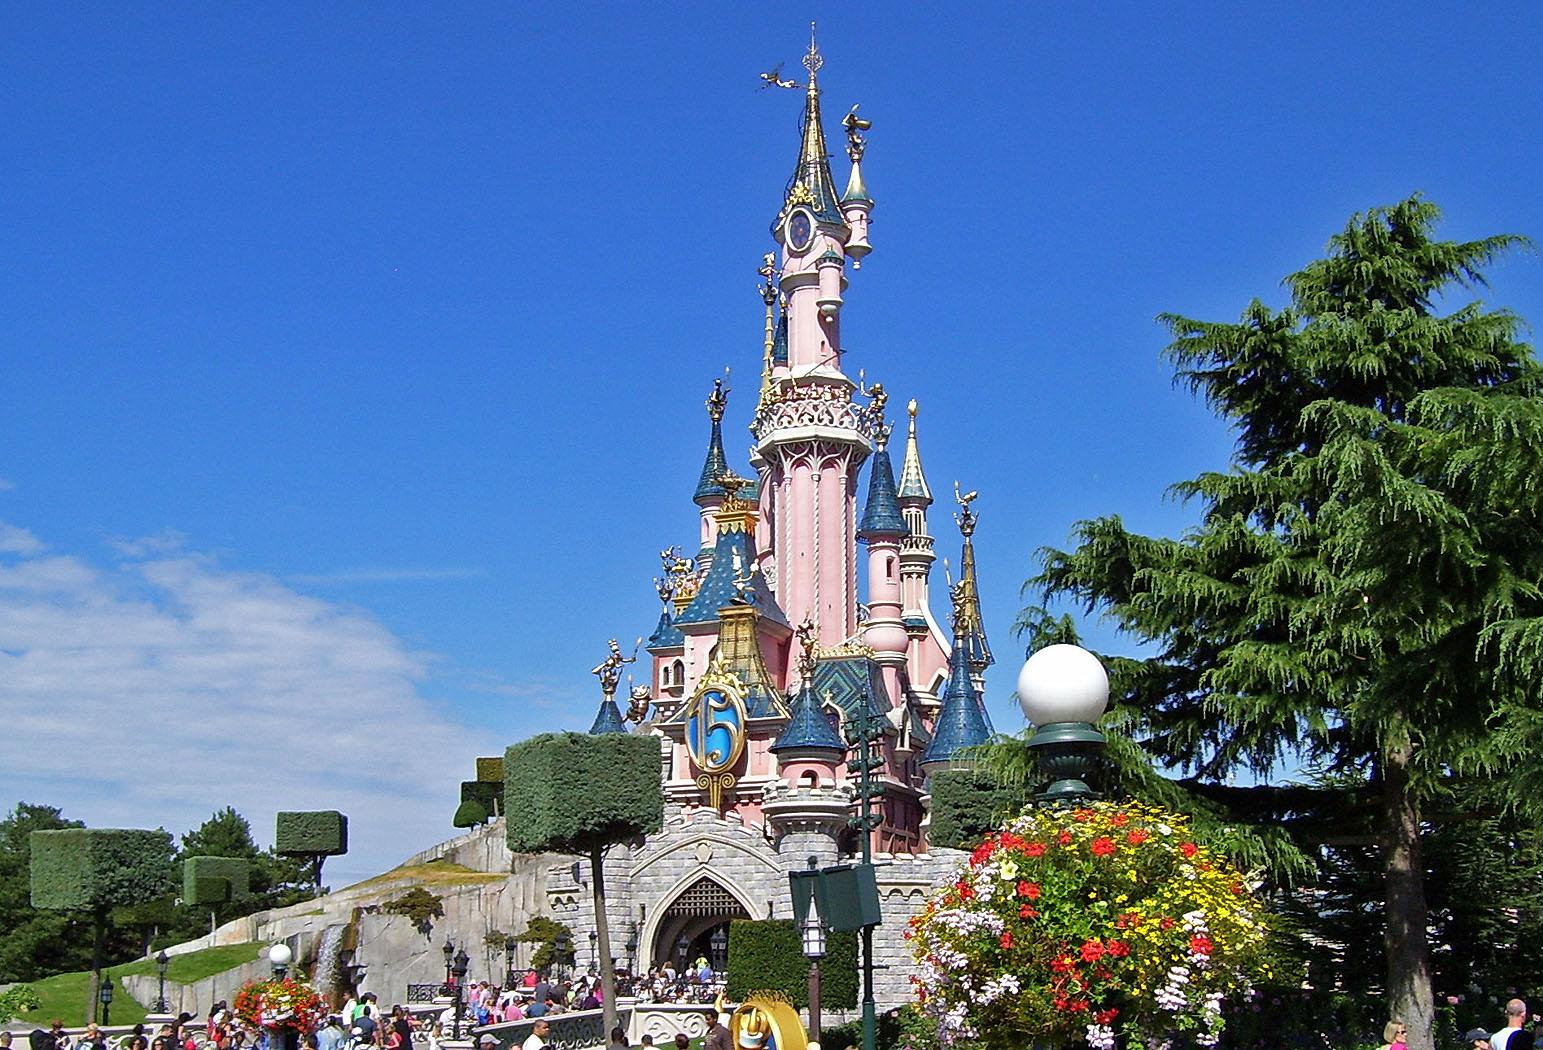 Harry Potter Quotes Desktop Wallpaper Paris Paris Disneyland Rides